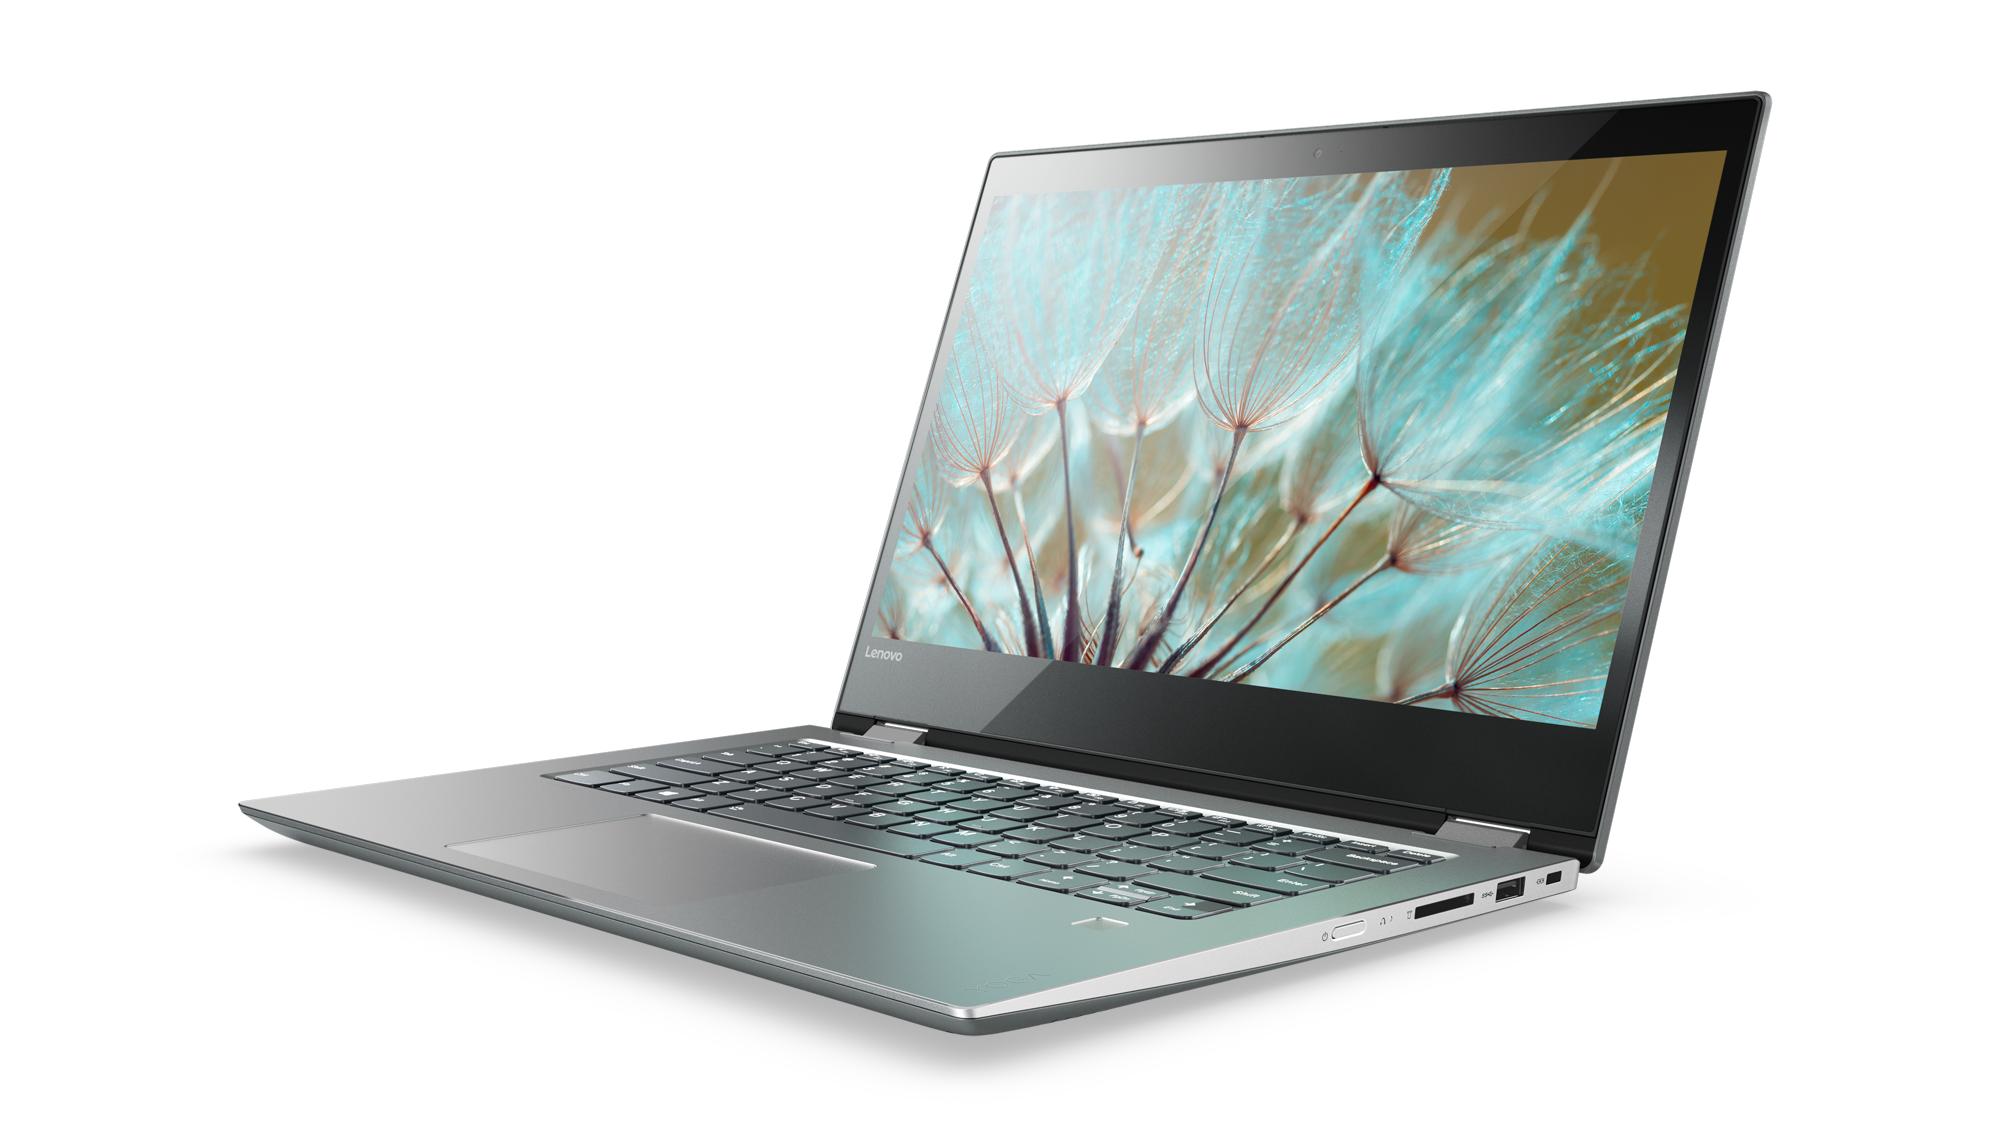 "Lenovo YOGA 520-14IKB i3-7100U 2,40GHz/4GB/SSD 128GB/14"" FHD/IPS/AG/multitouch/ActivePen/WIN10 šedá 80X8003SCK"